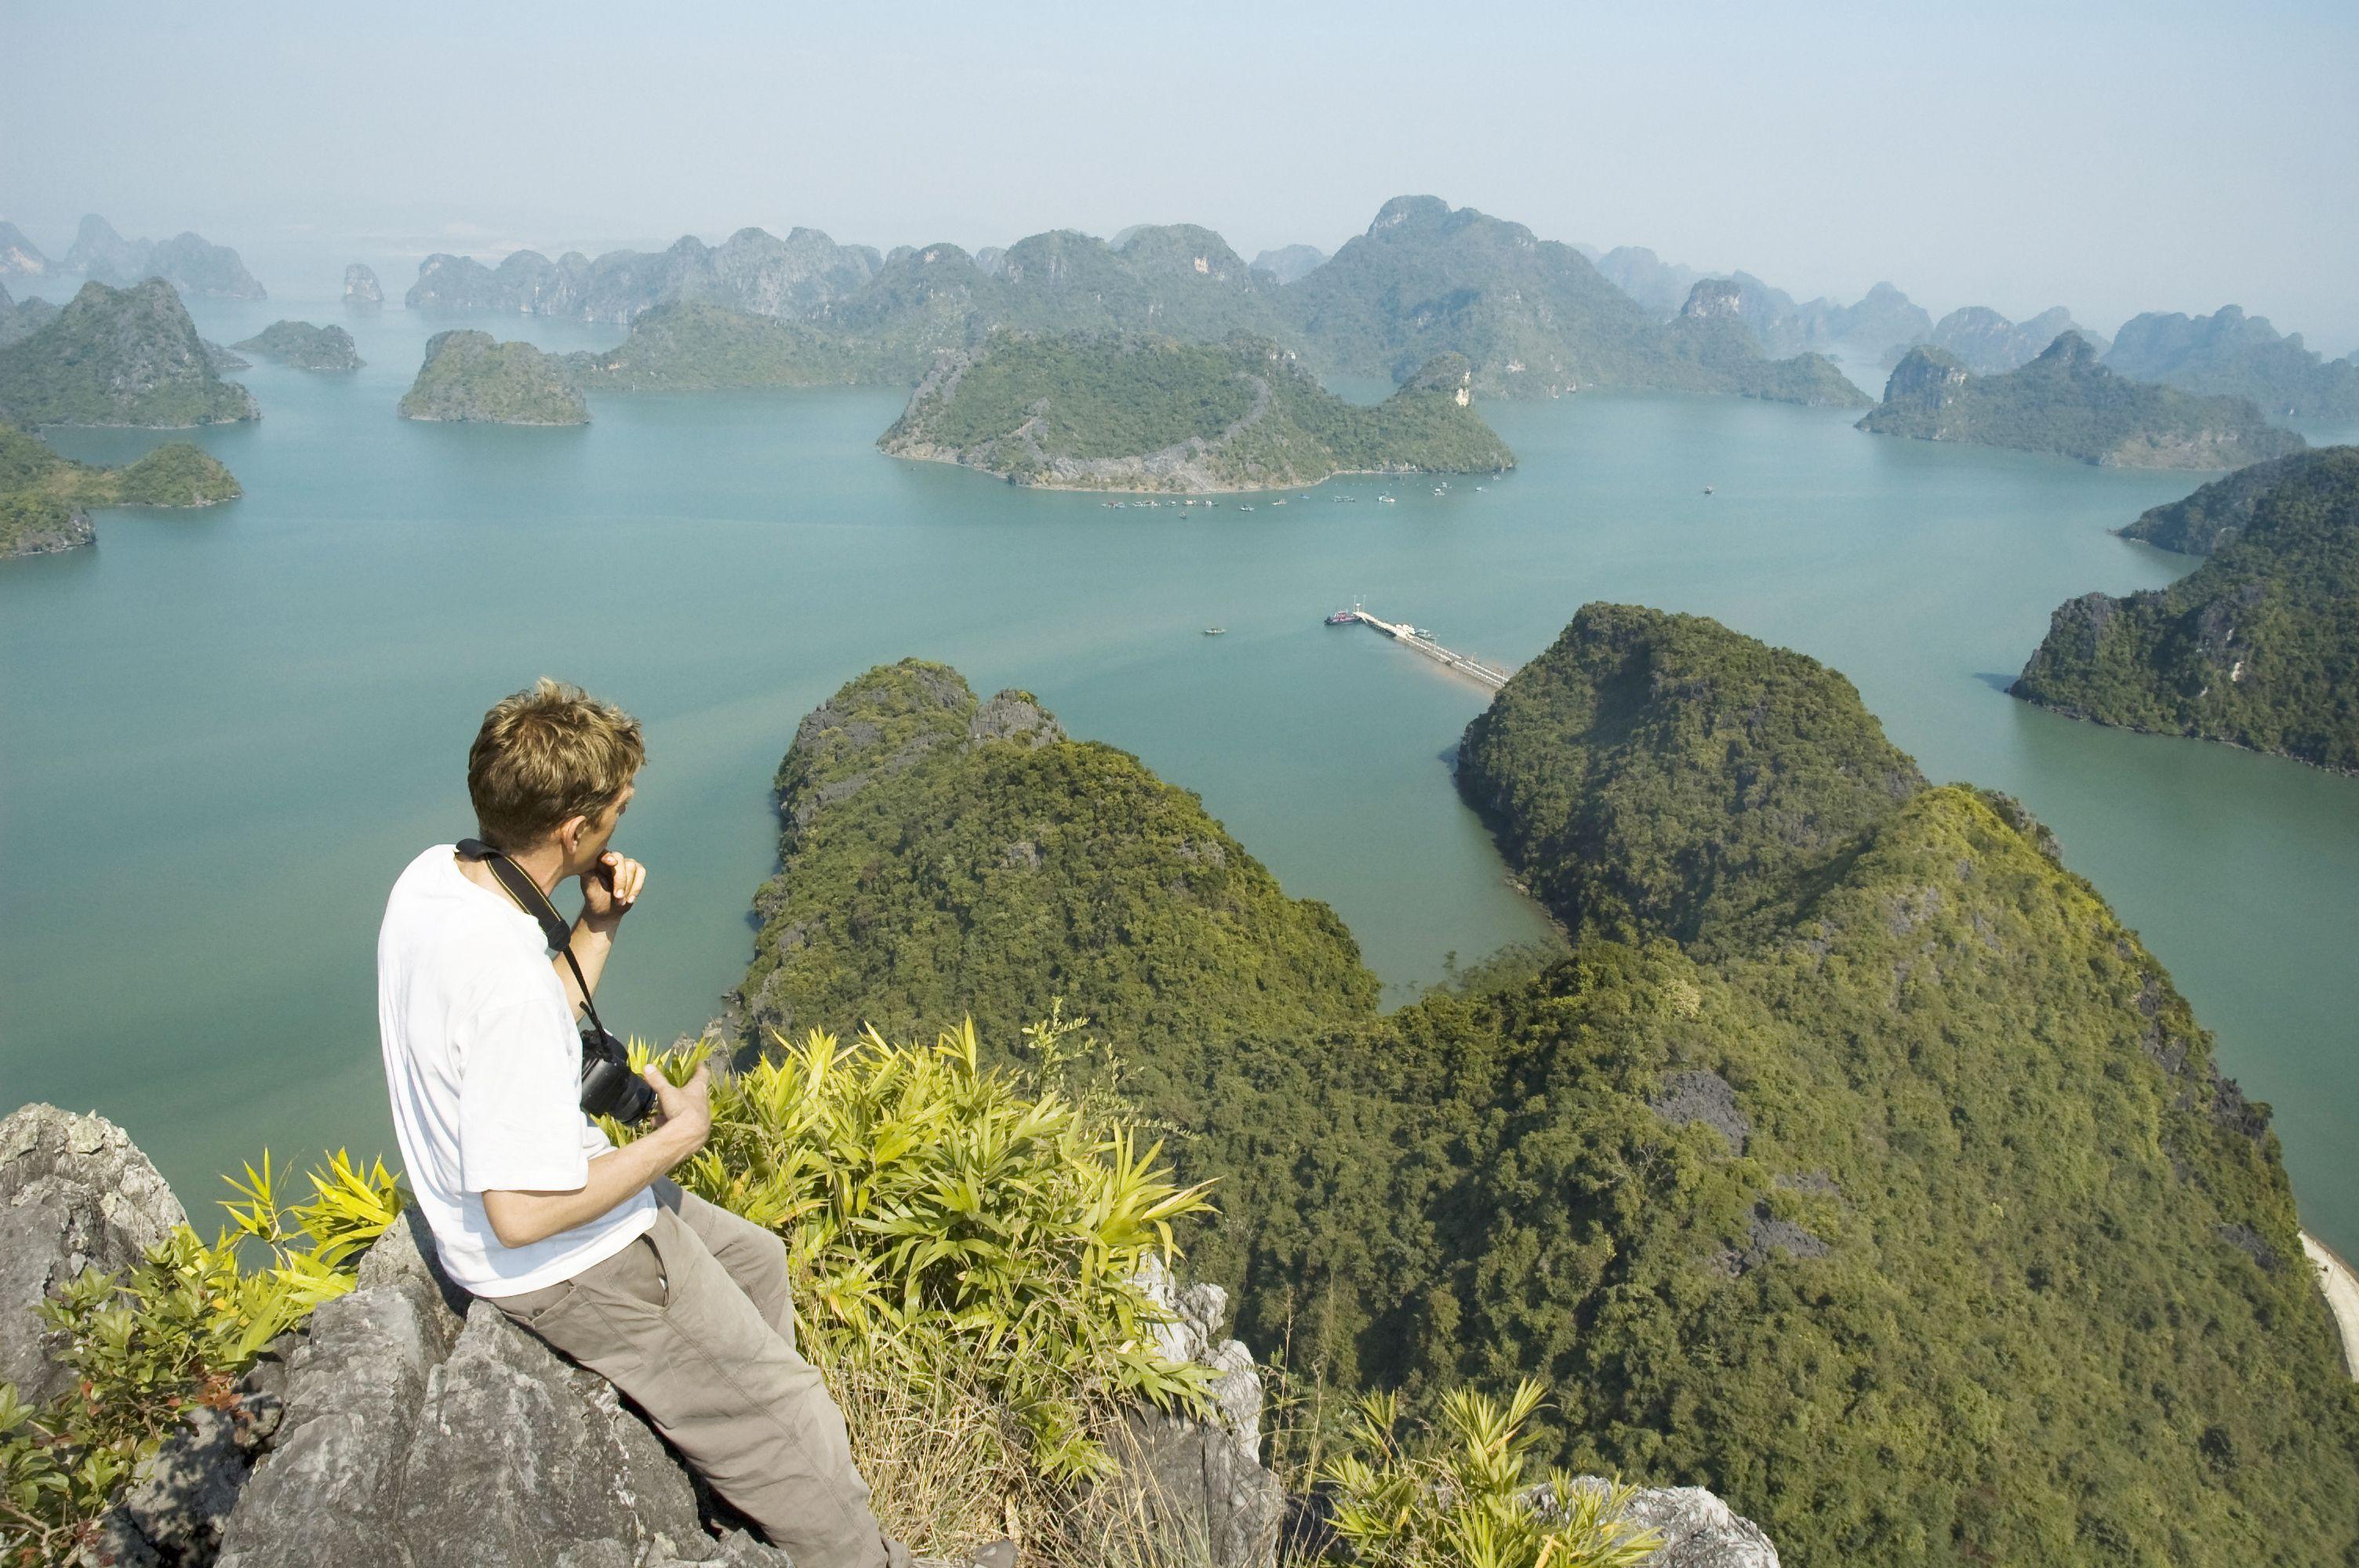 Hiker viewing Ha Long Bay from atop a crag